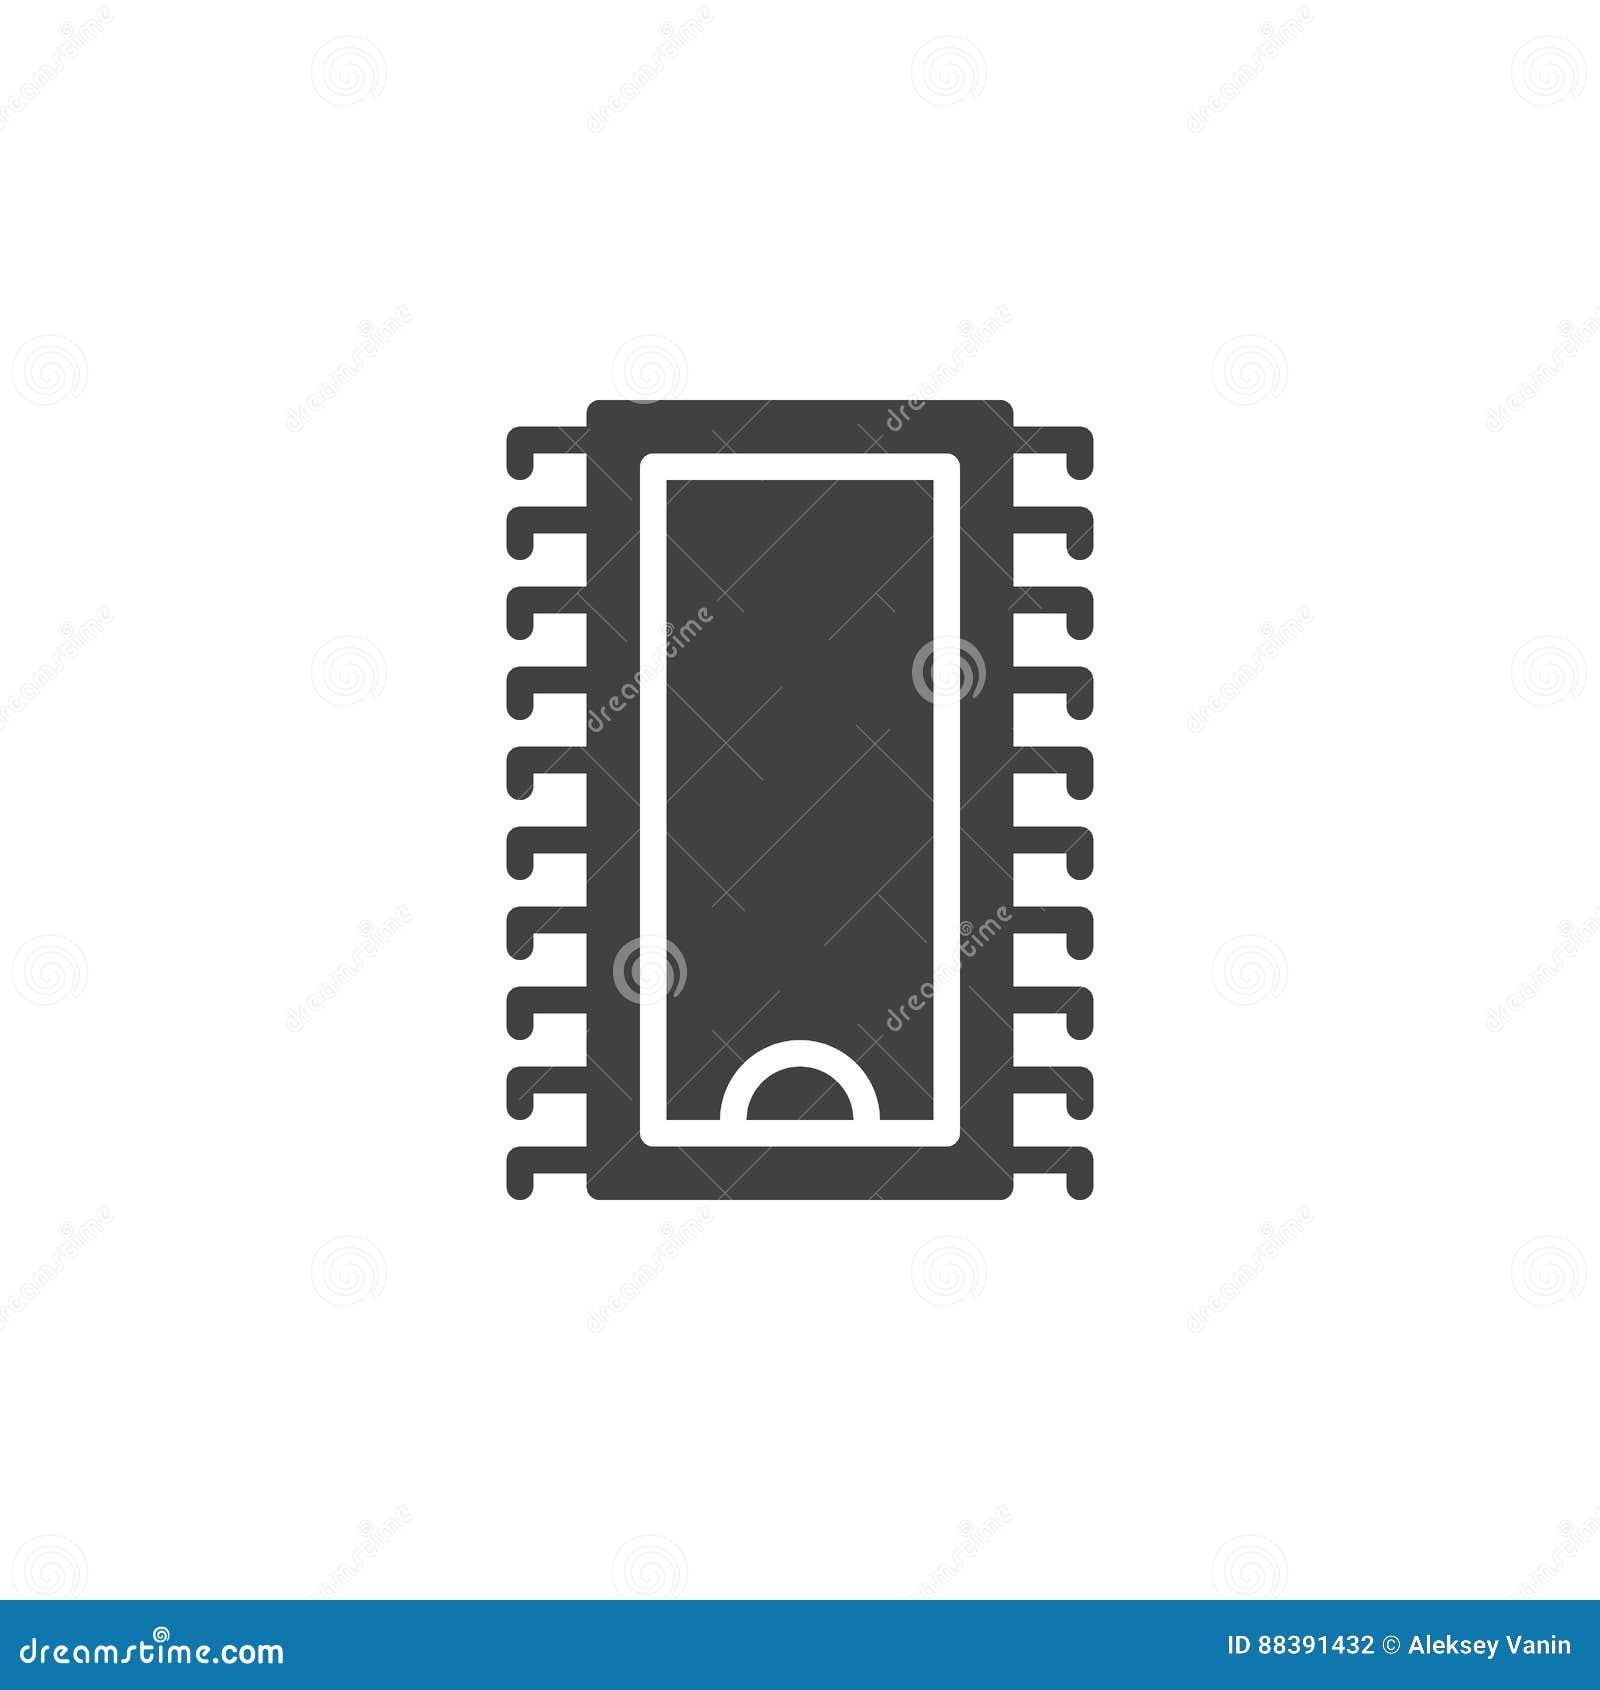 Großartig Schaltungskomponenten Symbole Ideen - Schaltplan Serie ...